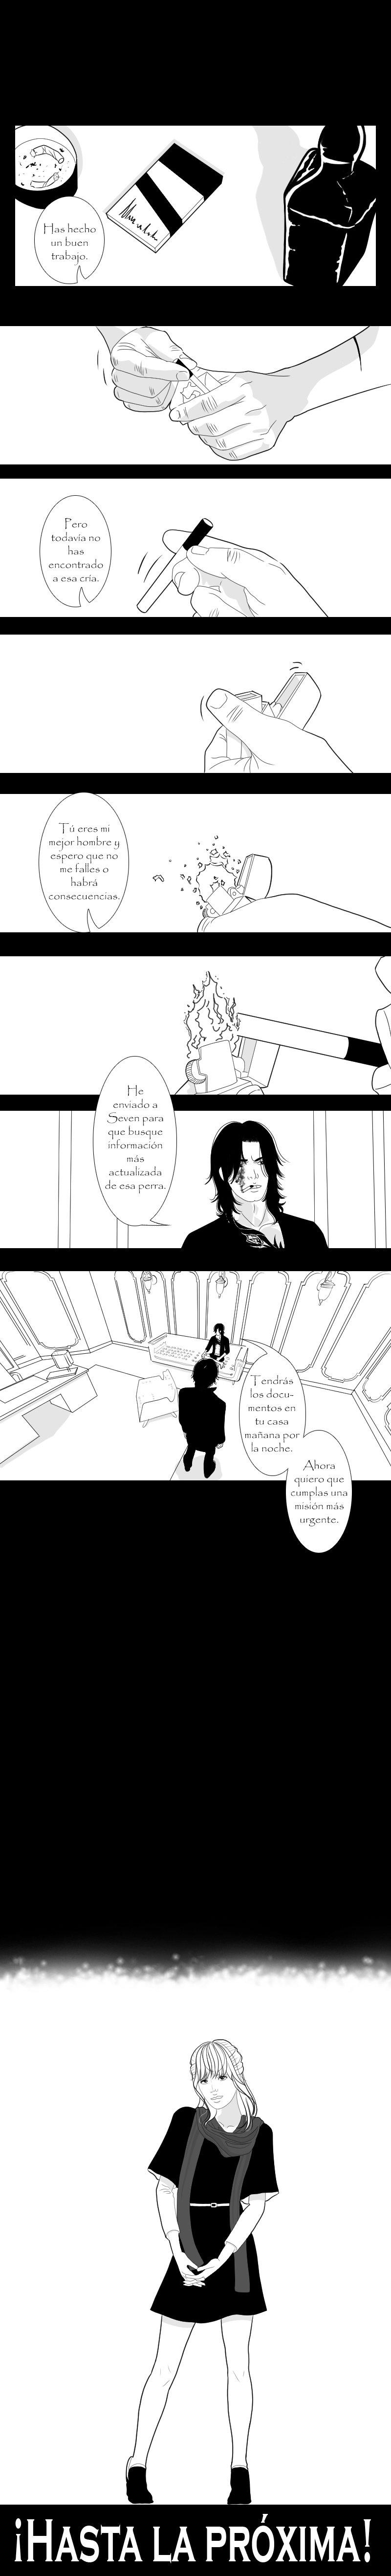 https://nine.mangadogs.com/es_manga/pic8/27/34331/943480/9f173dfe8f89078ce25d06126842cef1.jpg Page 3